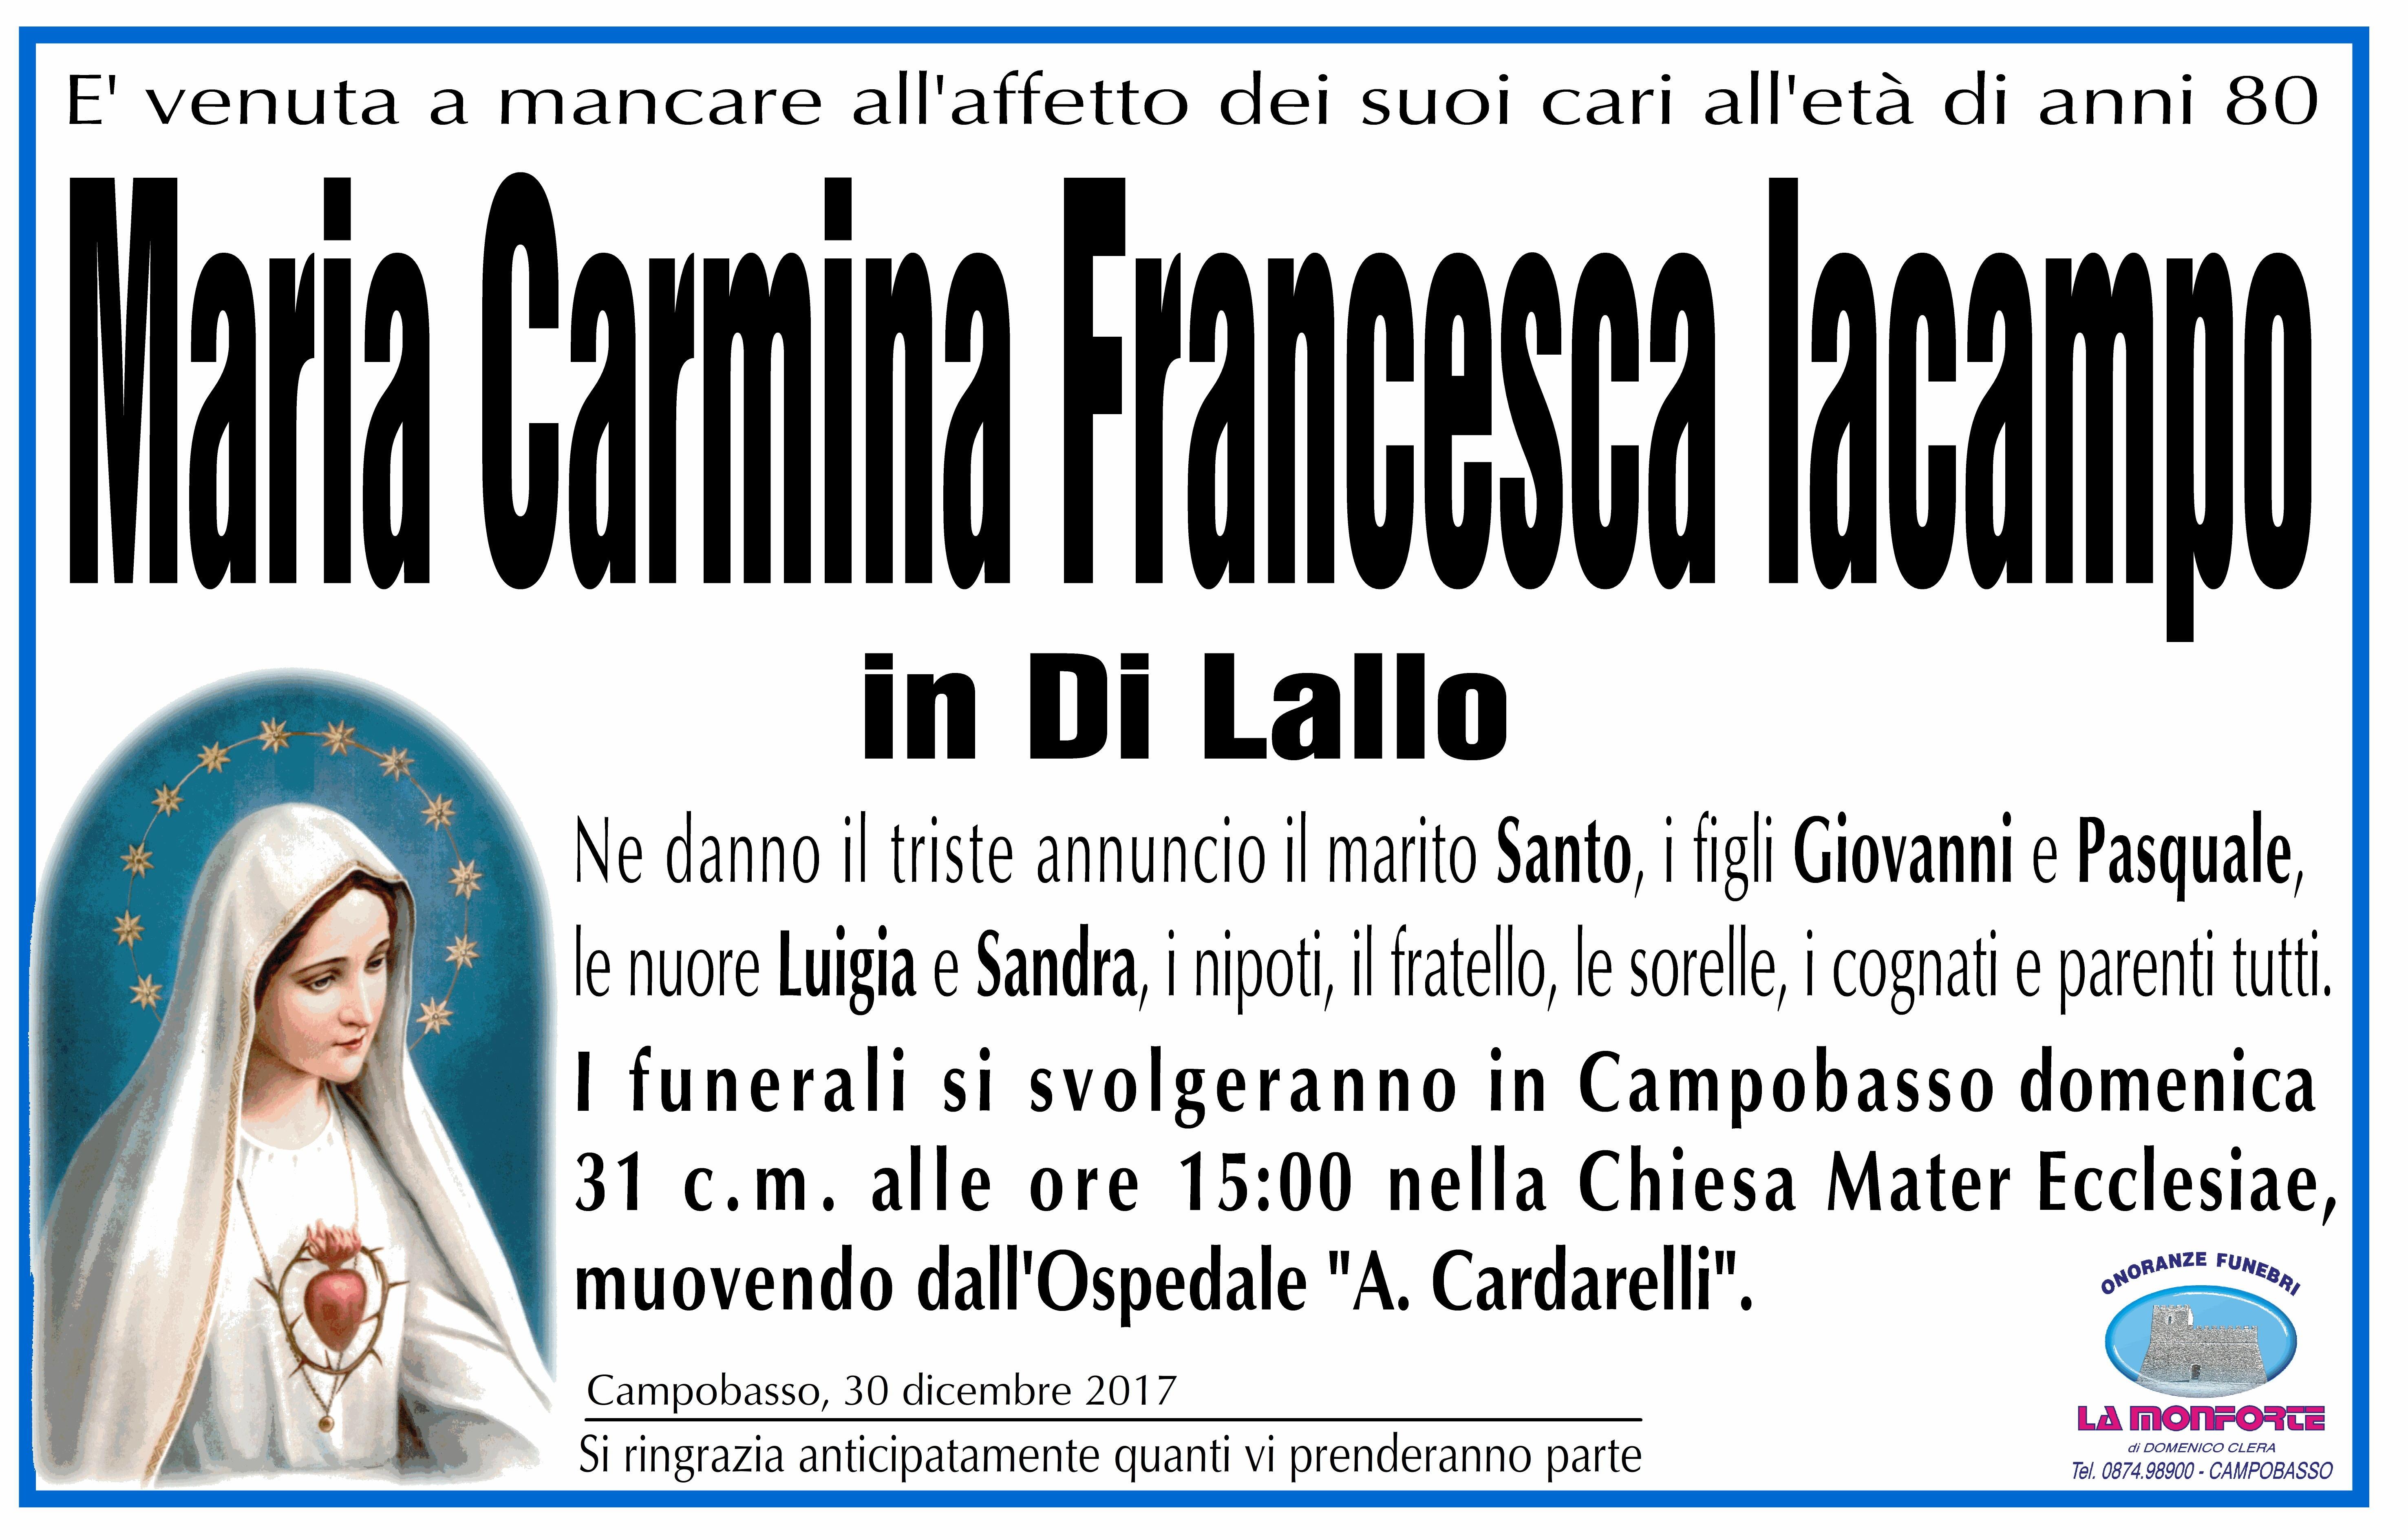 Maria Carmina Francesca Iacampo, 30/12/2017, Campobasso – Onoranze Funebri La Monforte